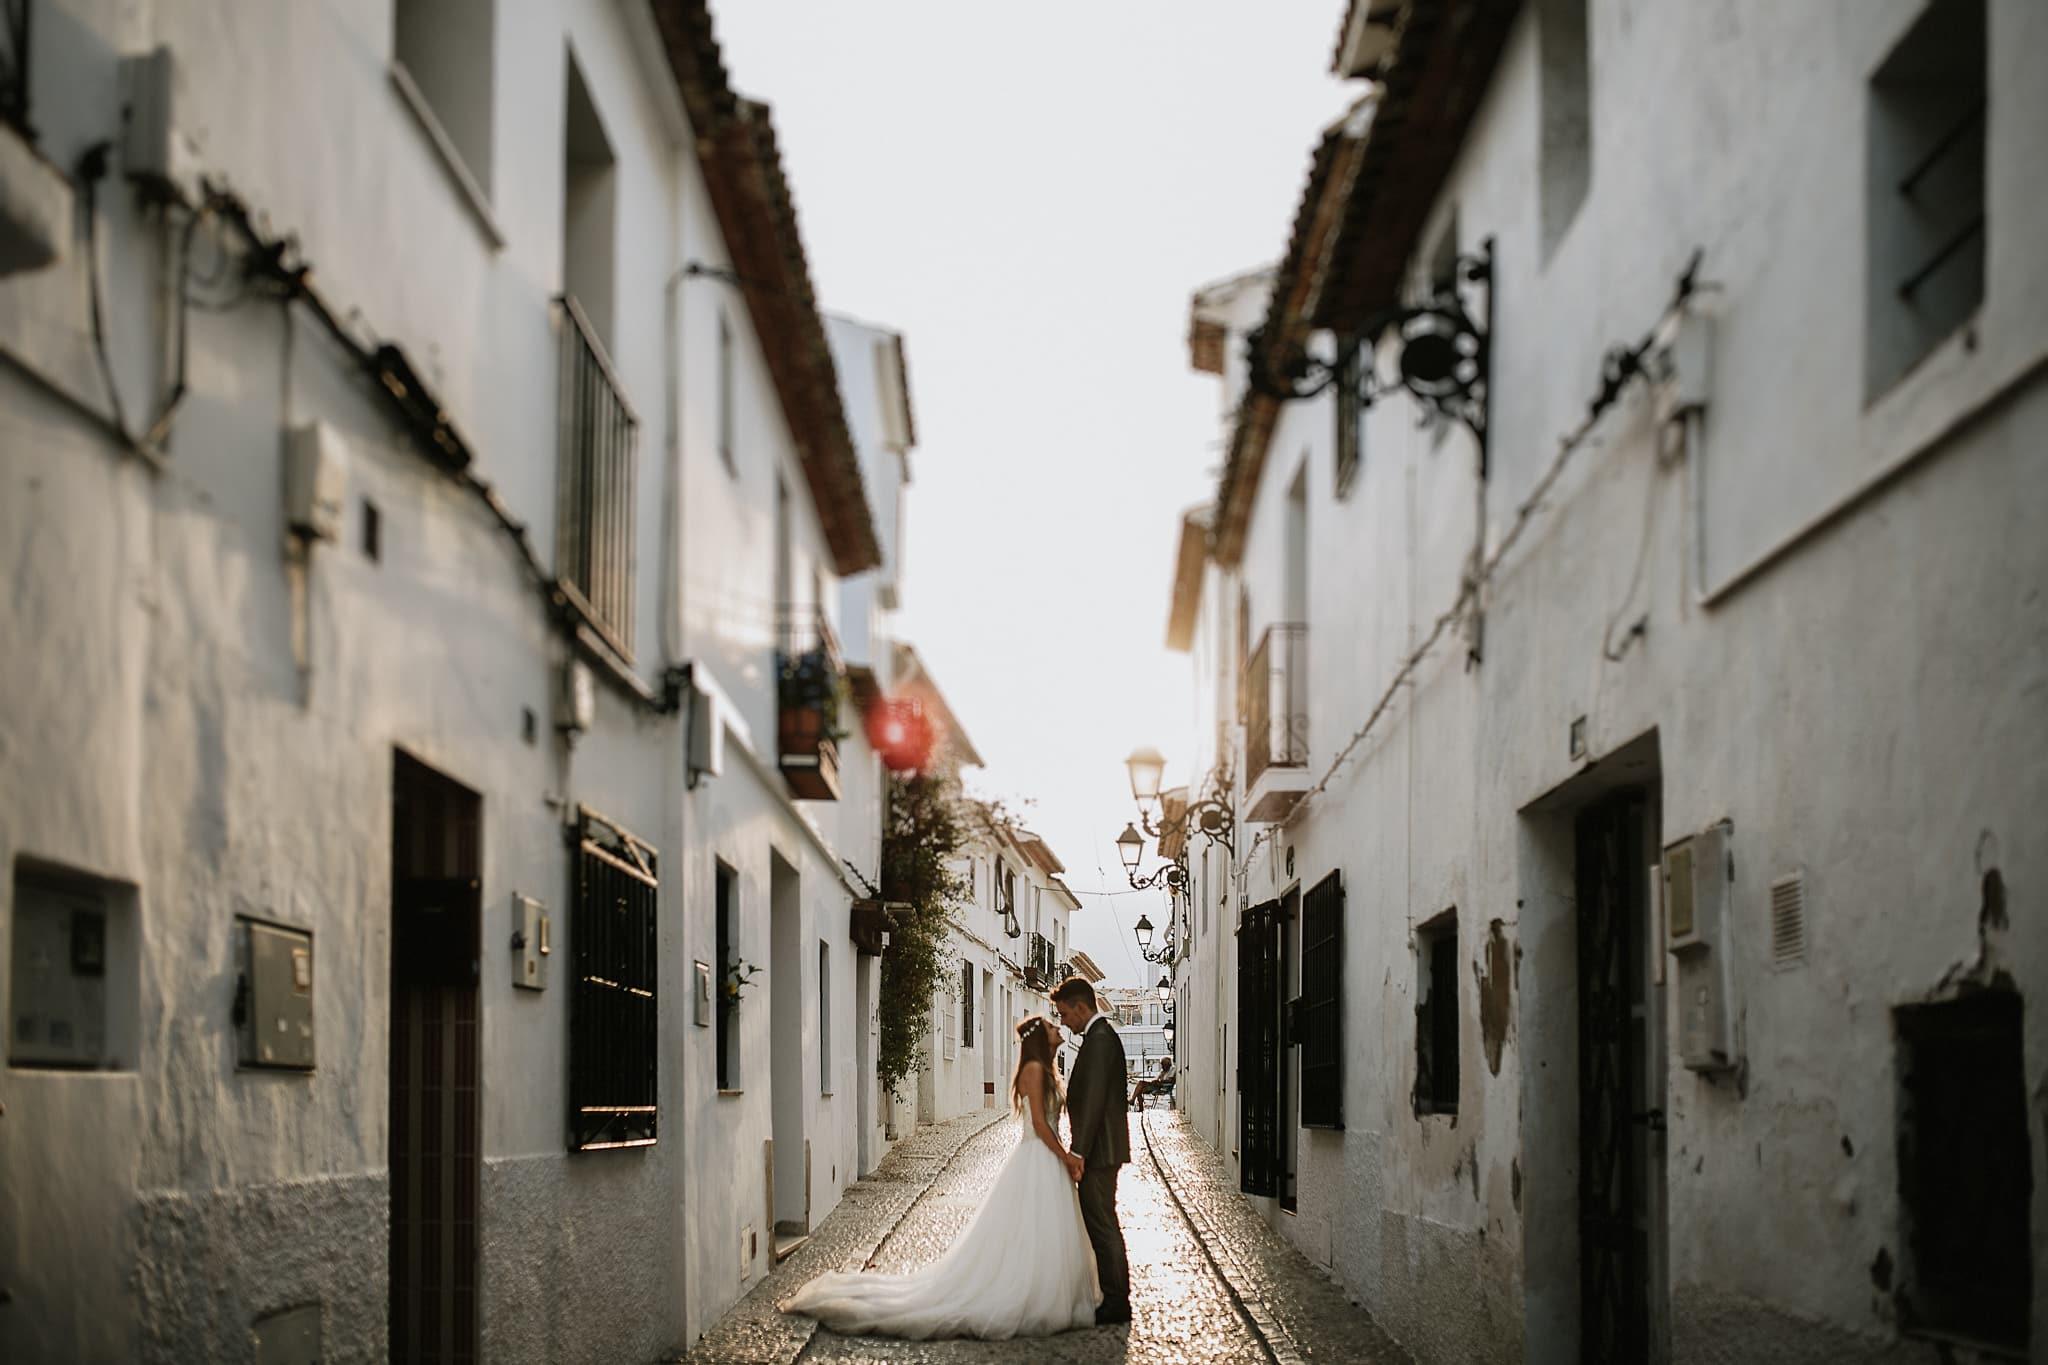 prisma-blanco-altea-wedding-photographer-42